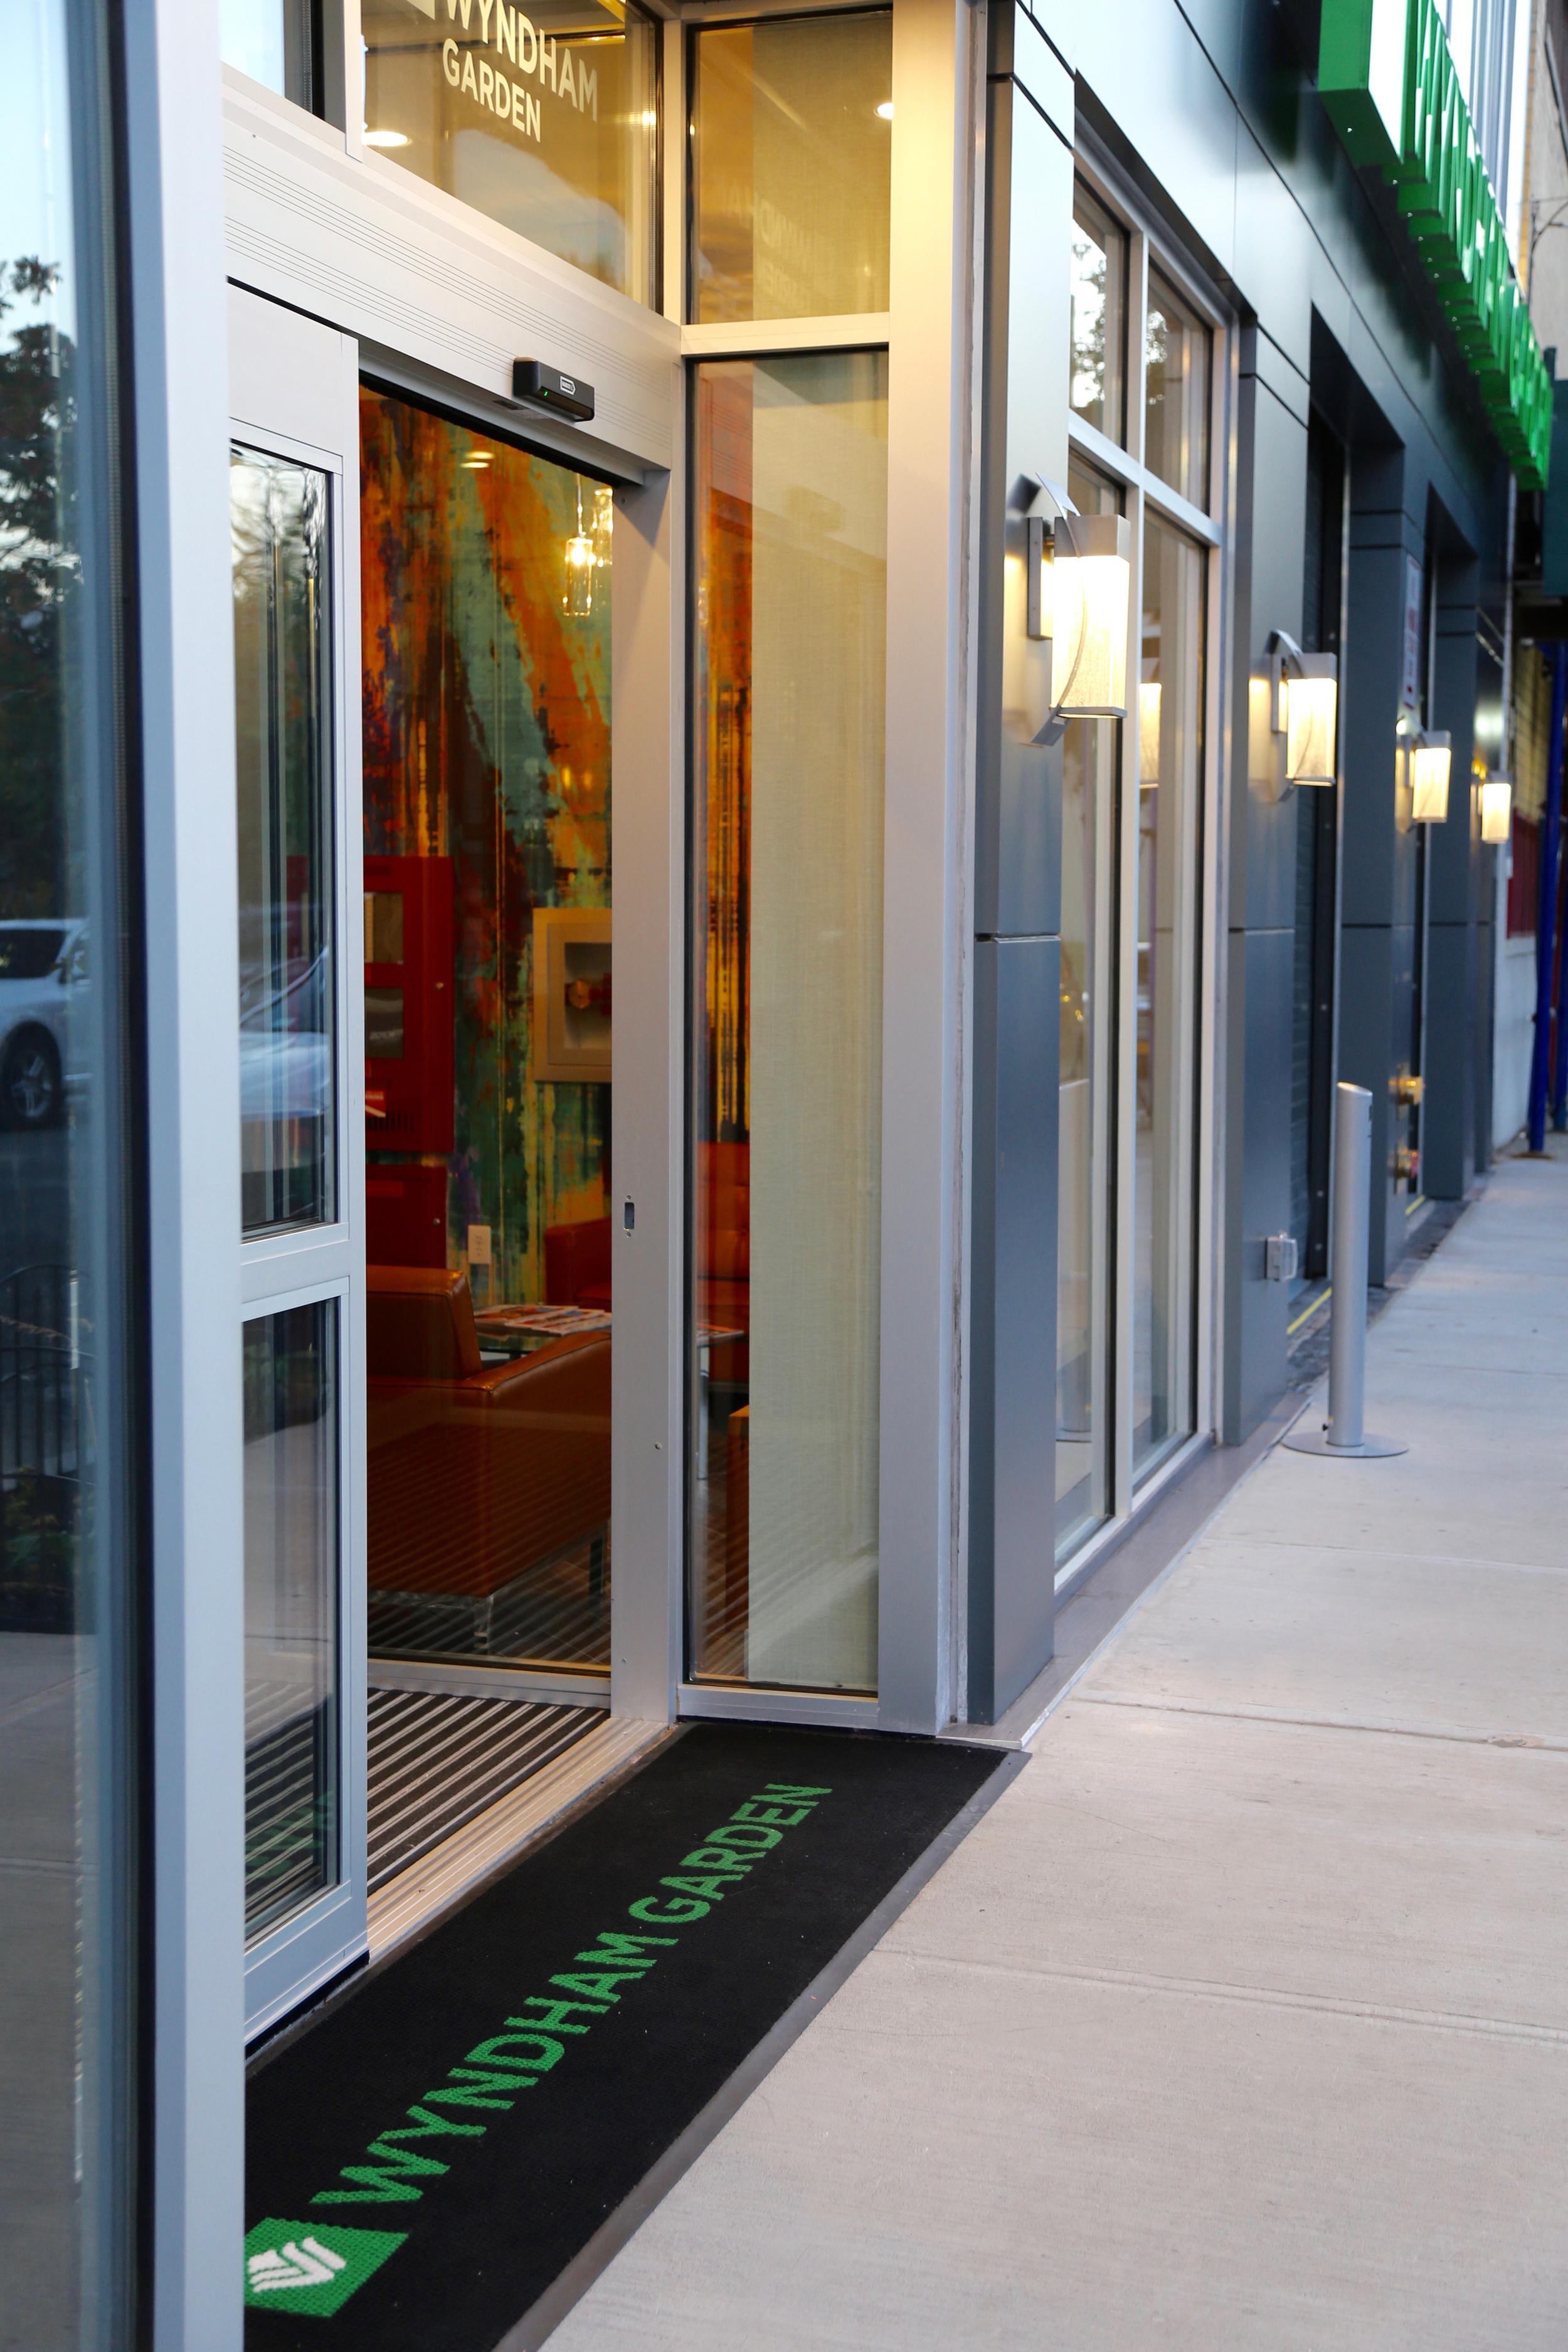 Wyndham Garden LaGuardia South Hotel Entrance